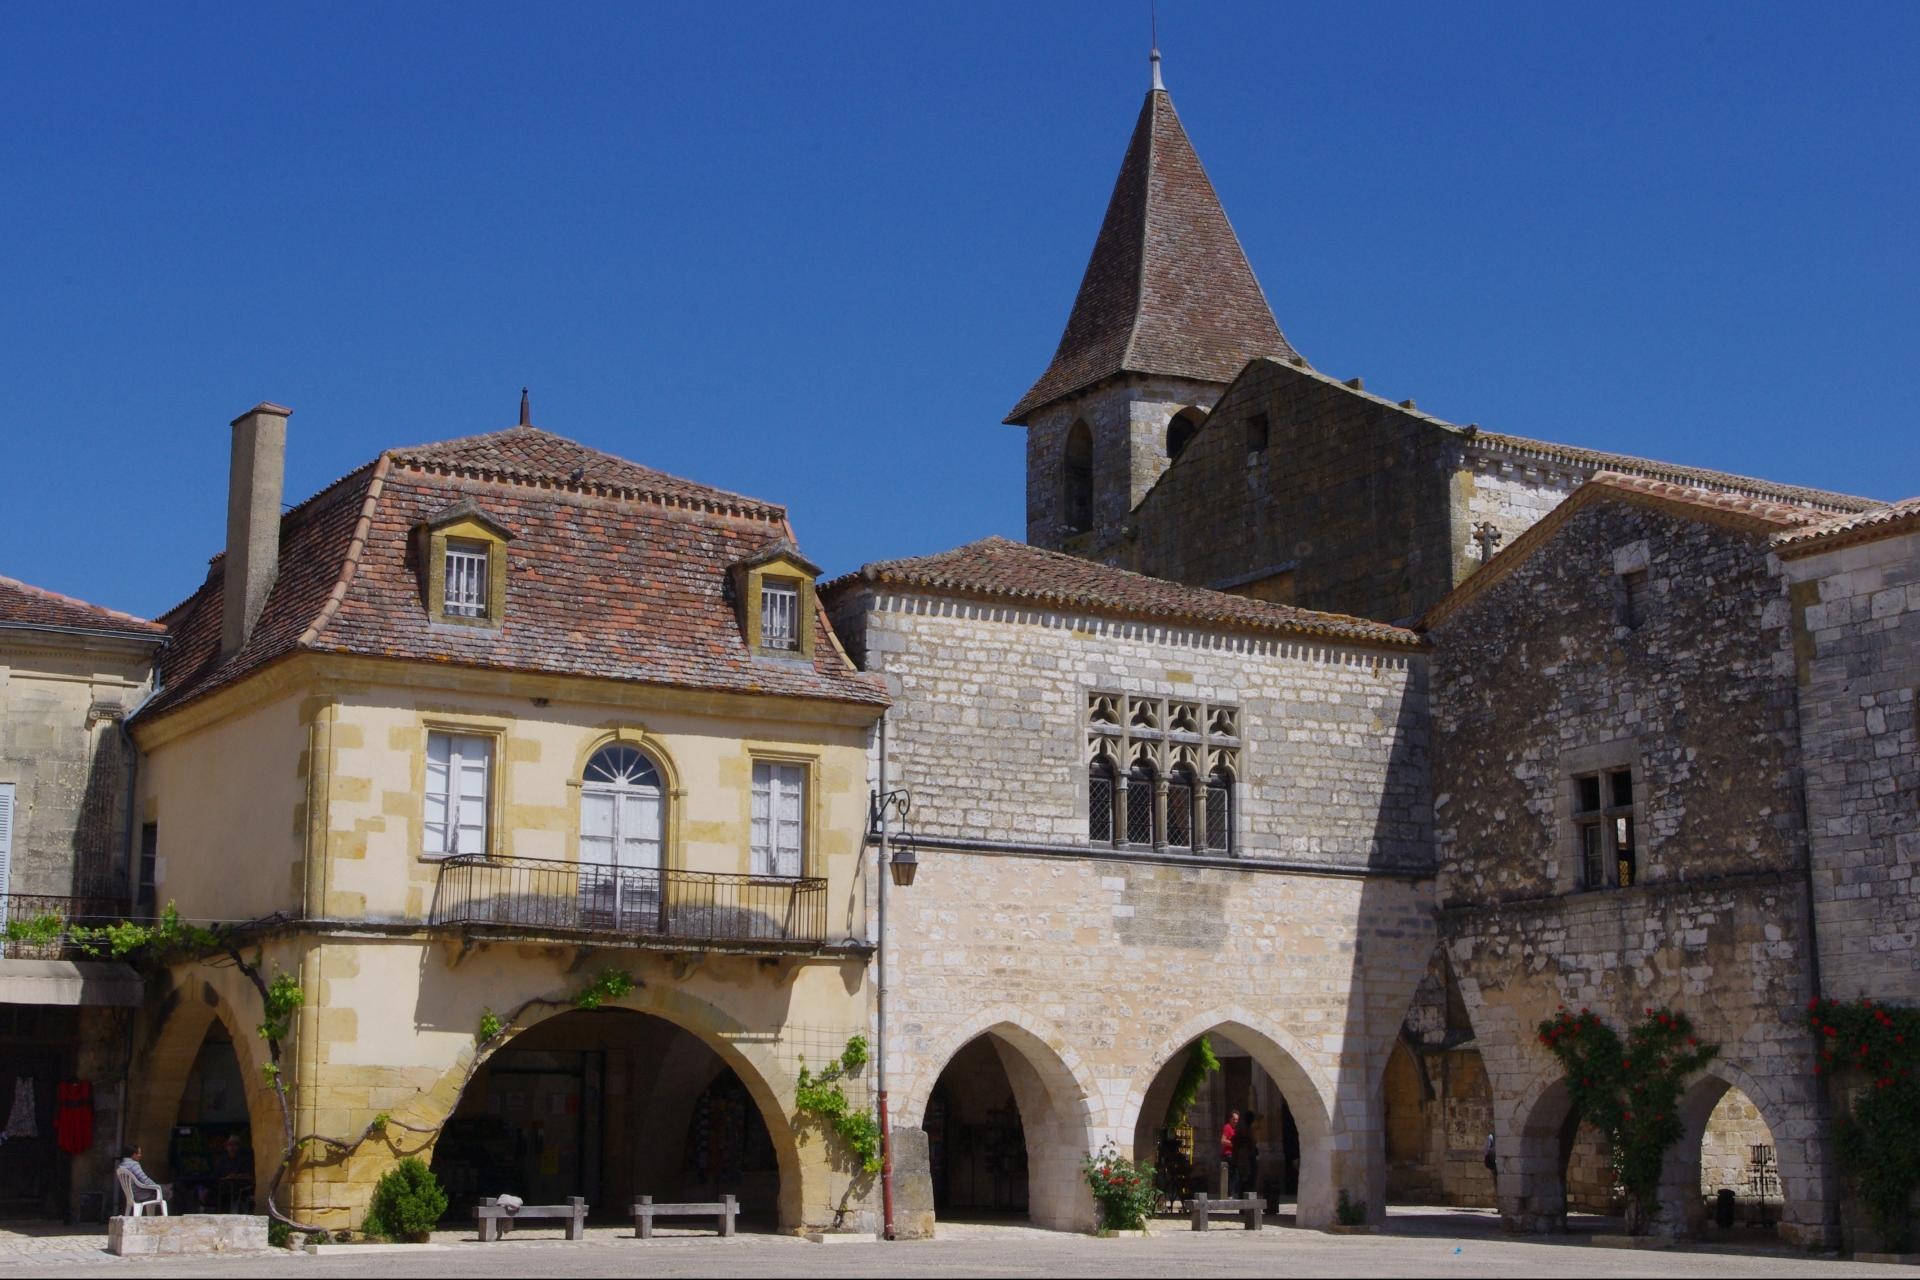 Dordogne France Private Self Guided Bike Tour